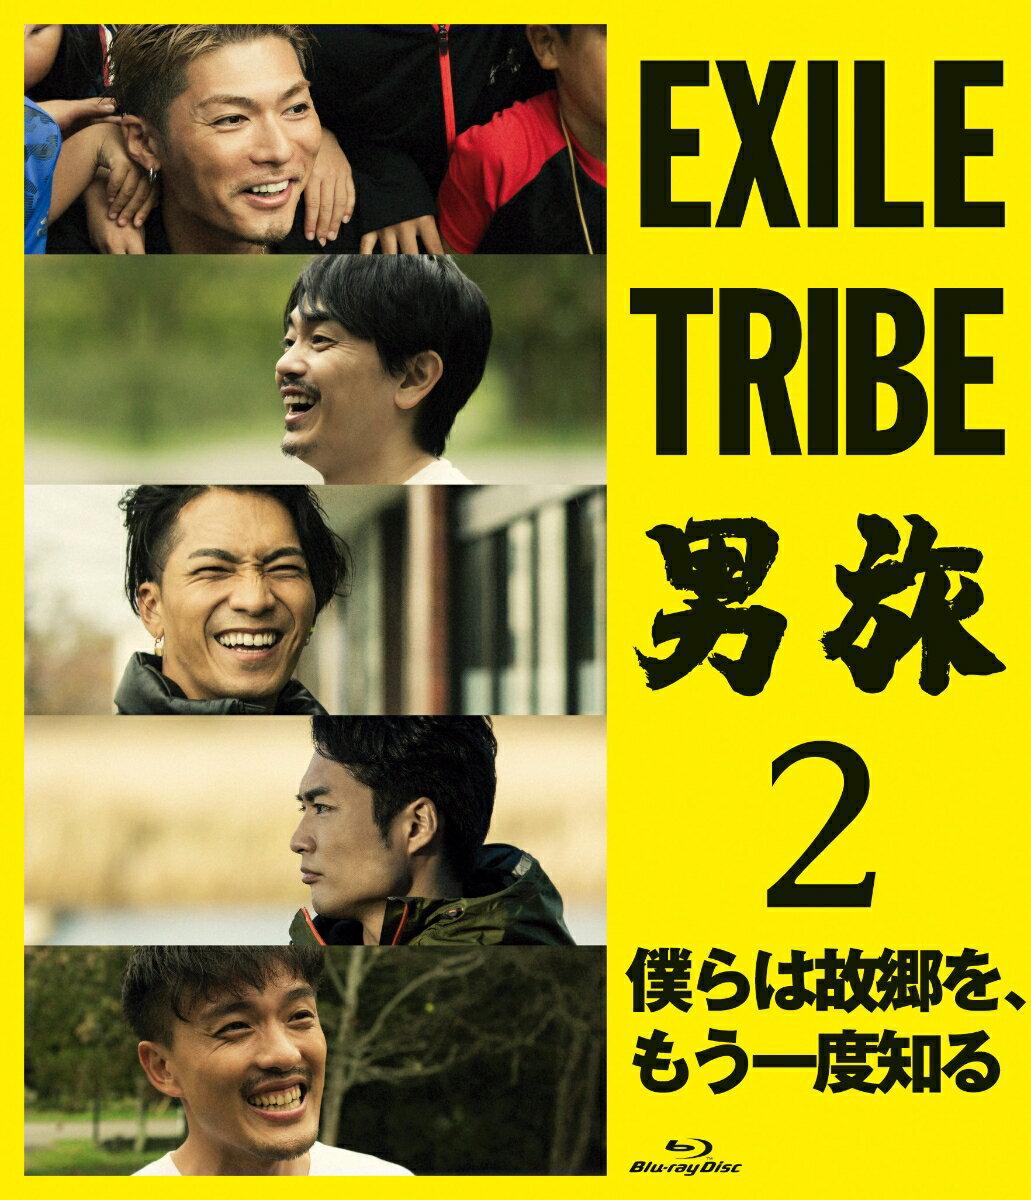 EXILE TRIBE 男旅2 僕らは故郷を、もう一度知る(スマプラ対応)【Blu-ray】